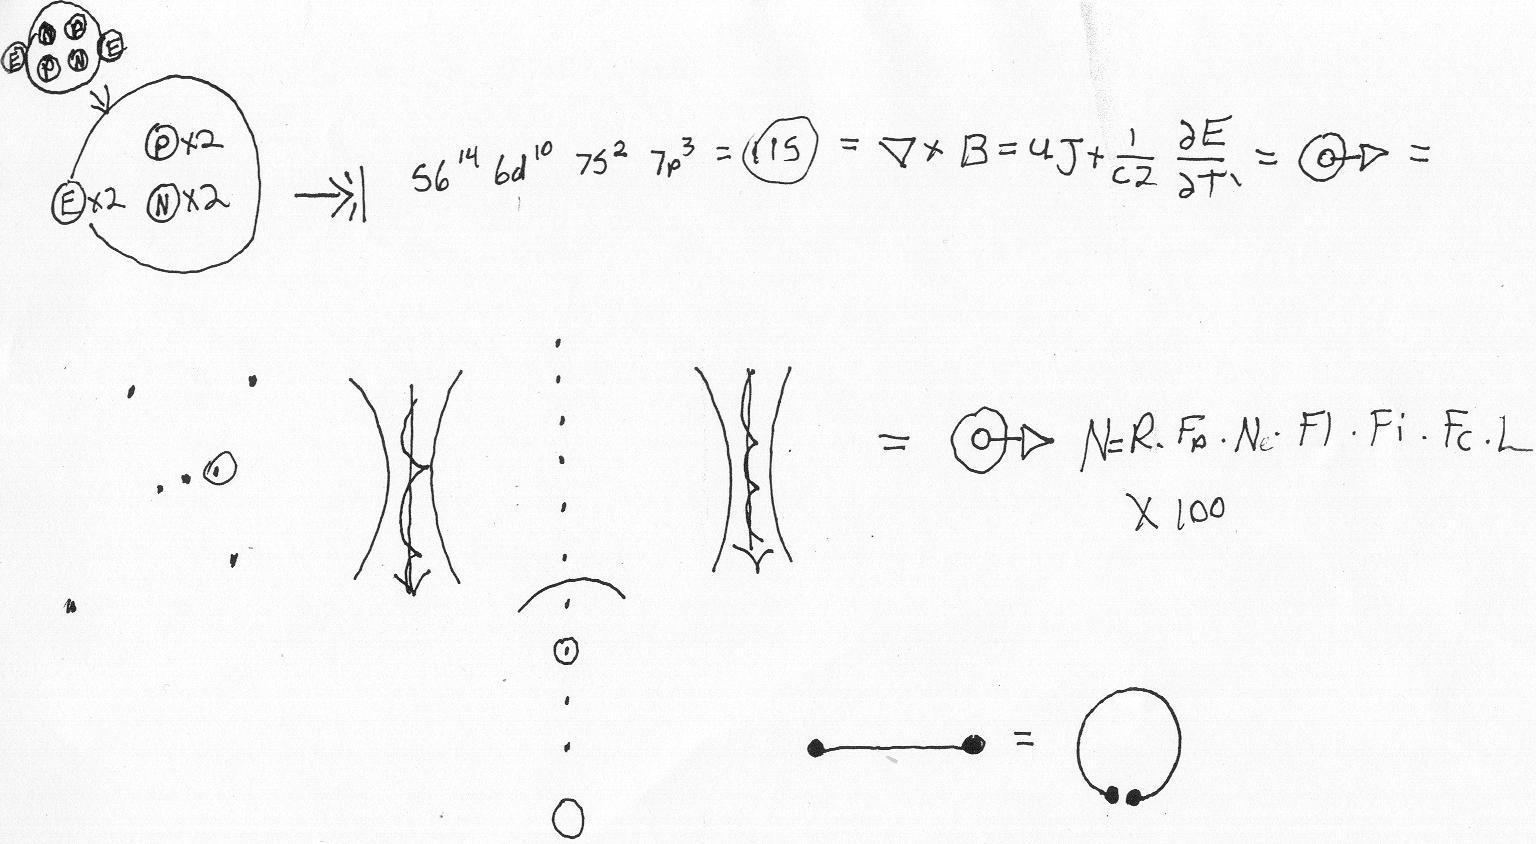 Stan romaneks mystery equations buycottarizona Image collections